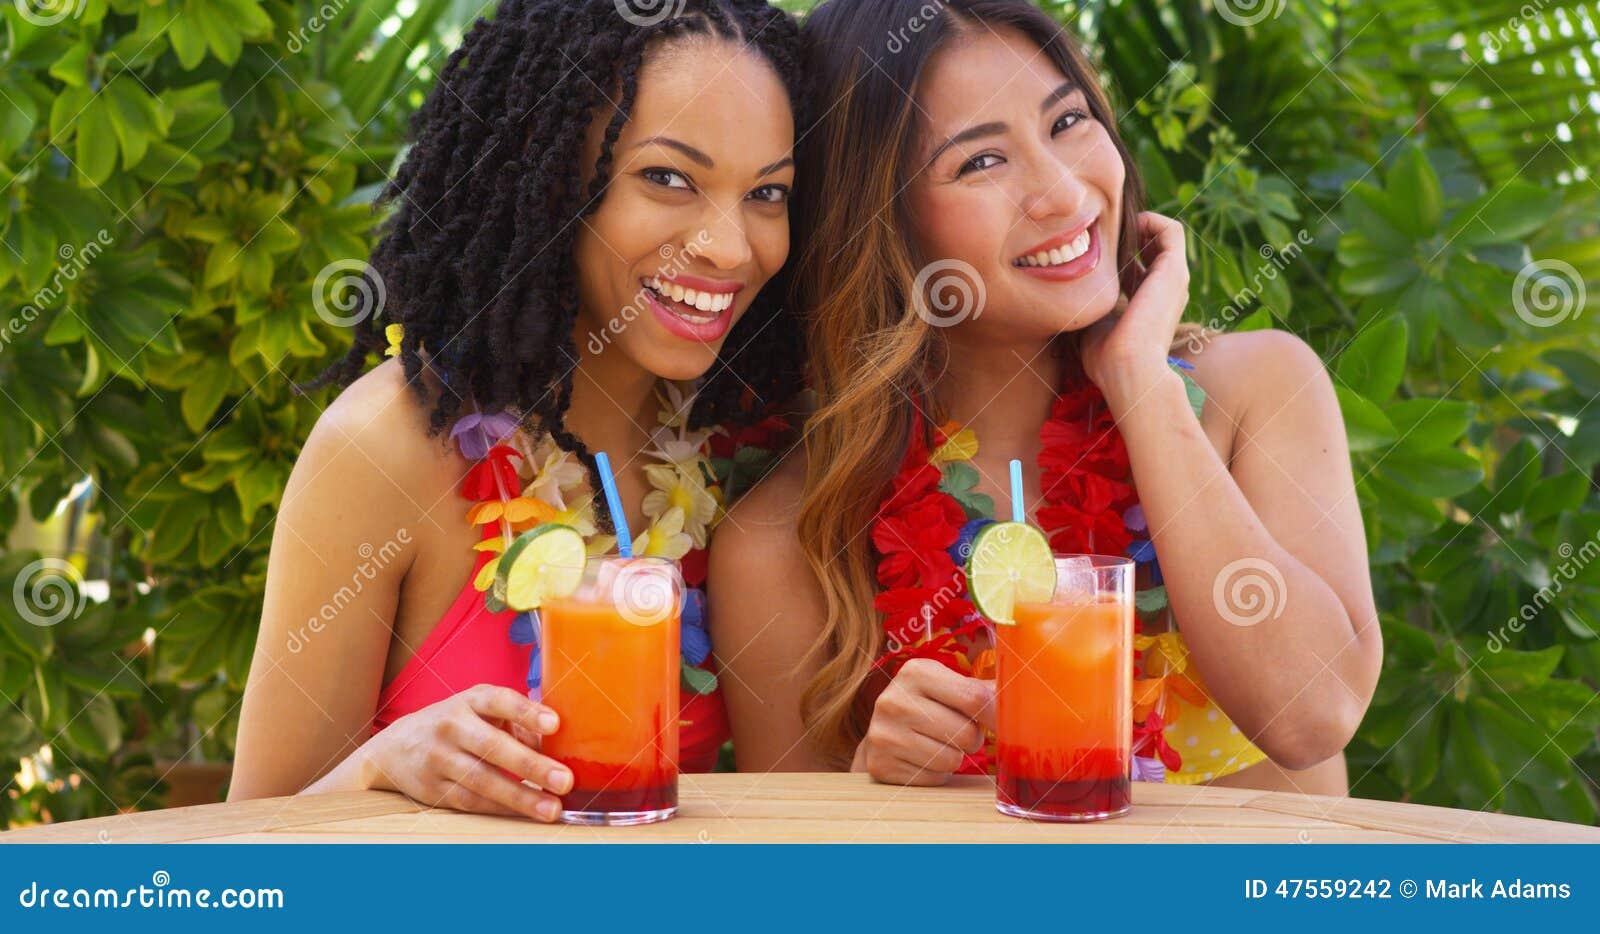 Milking Lesbians Pictures